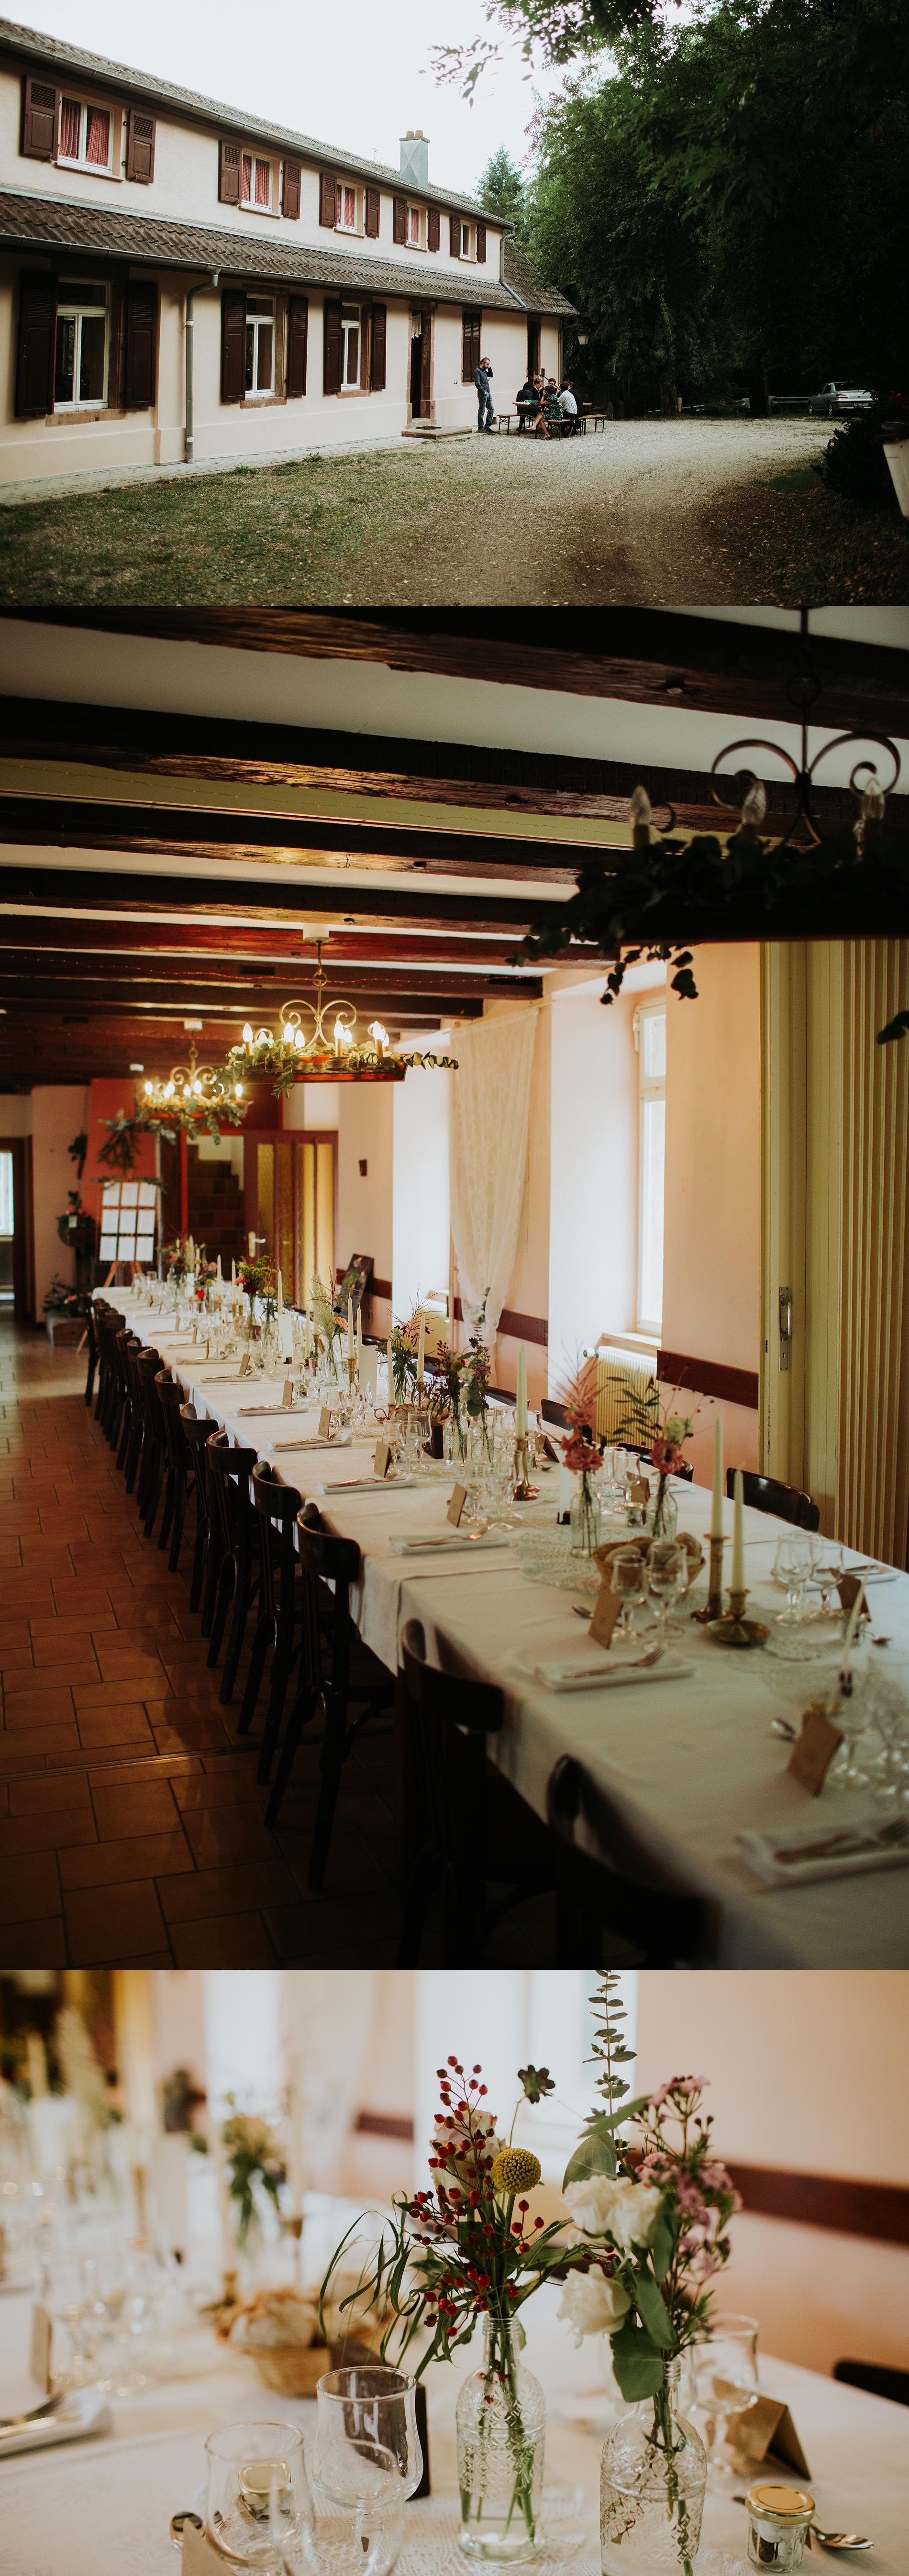 Mariage Alsace Haut Rhin